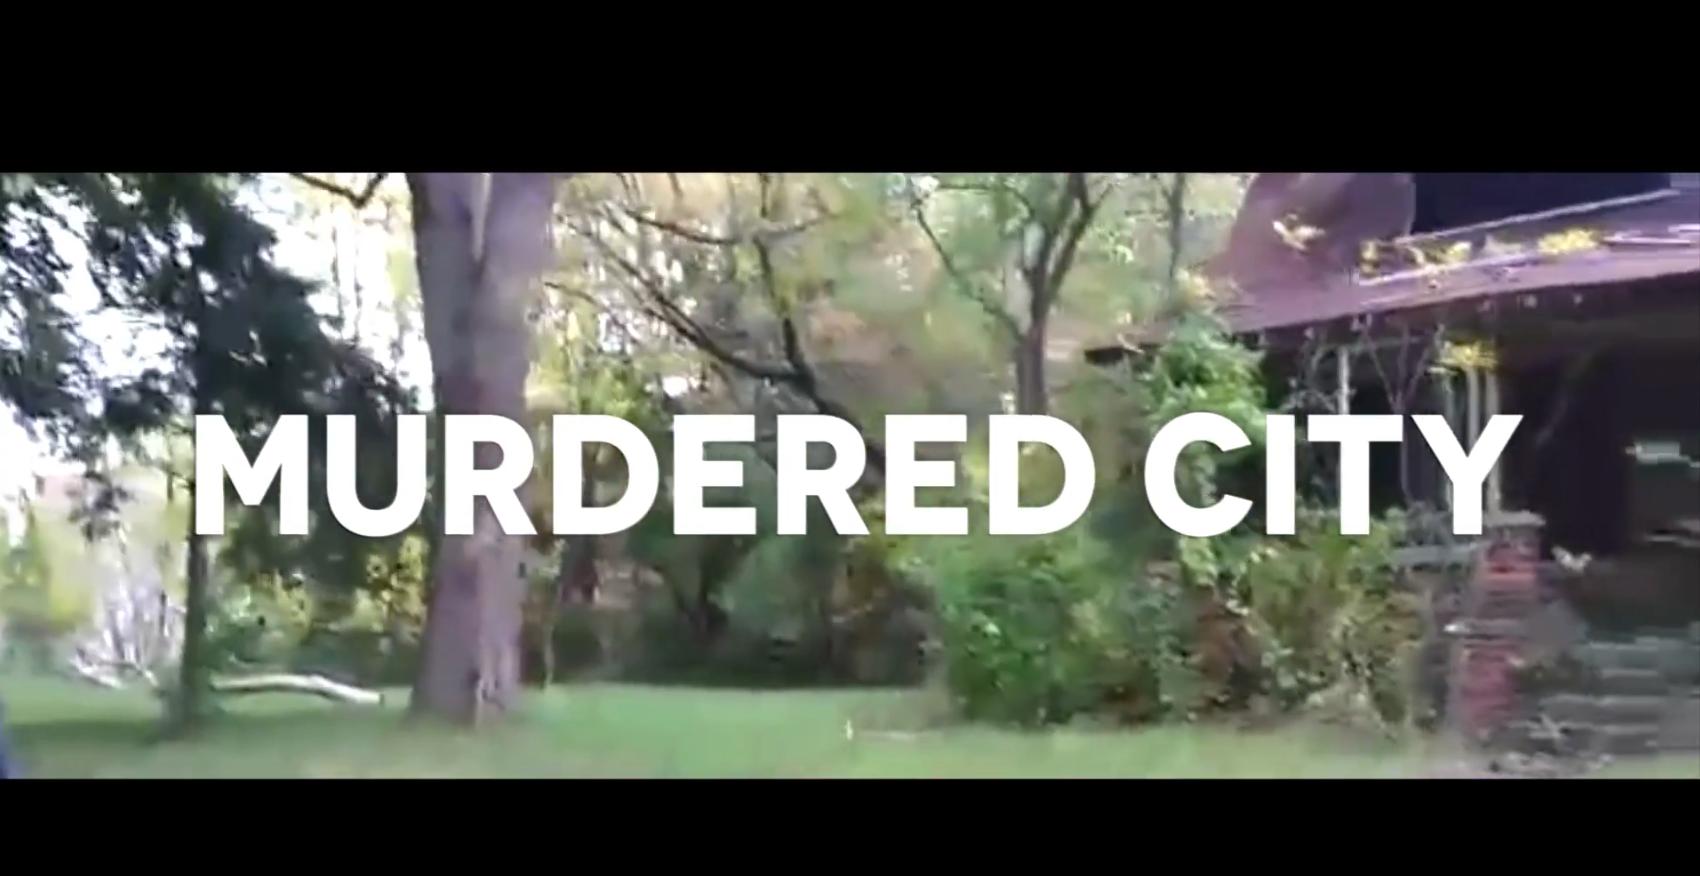 Murdered City music video